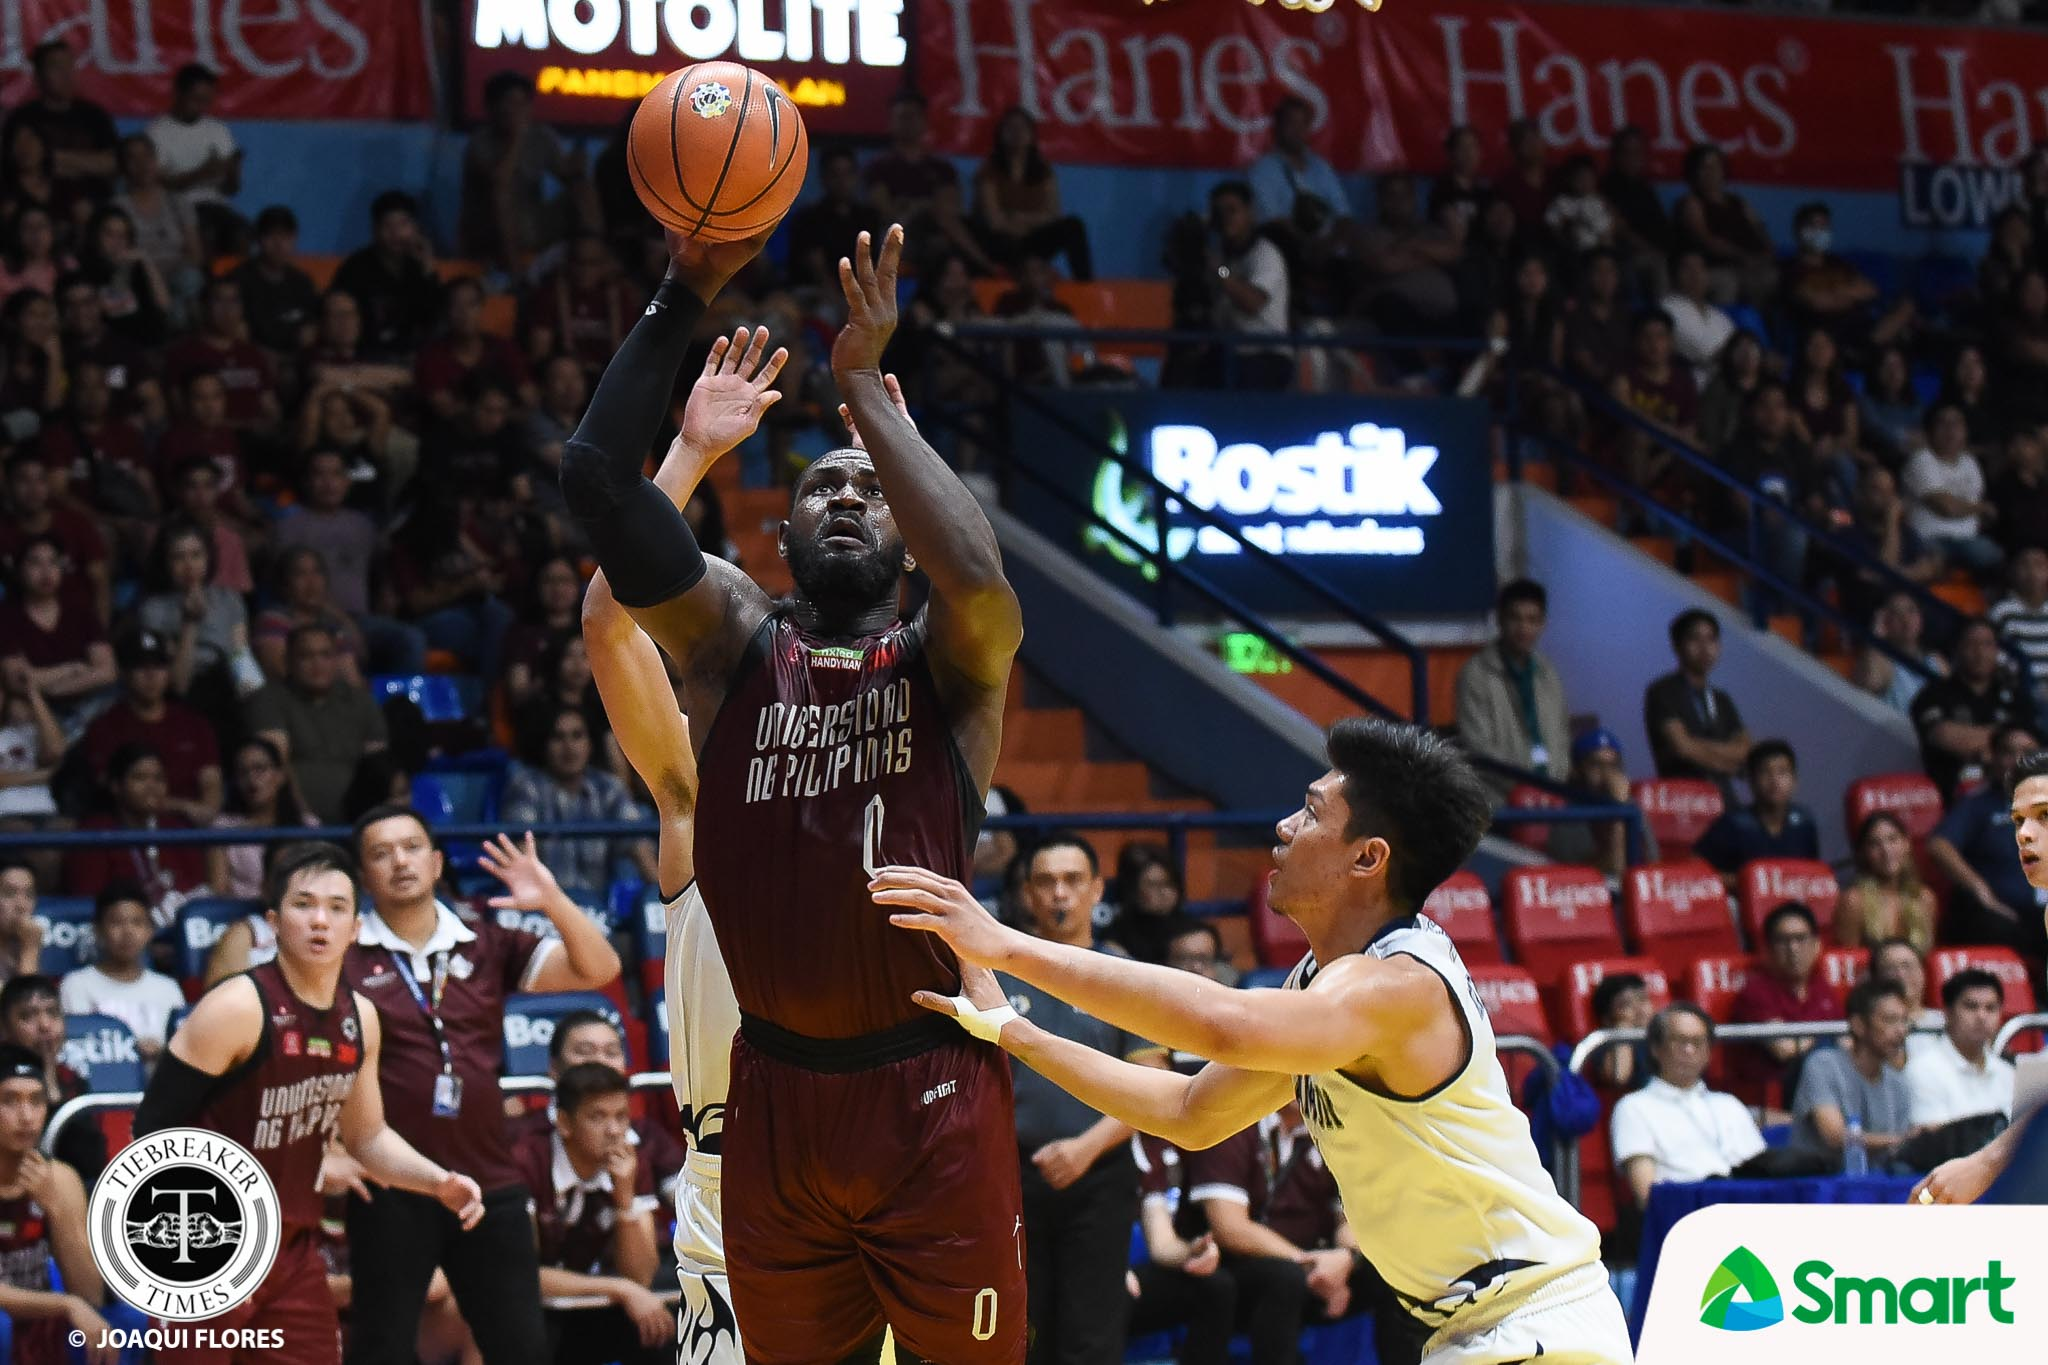 Tiebreaker Times Bo Perasol finds silver-lining in loss to Adamson Basketball News UAAP UP  UP Men's Basketball UAAP Season 81 Men's Basketball UAAP Season 81 Bo Perasol